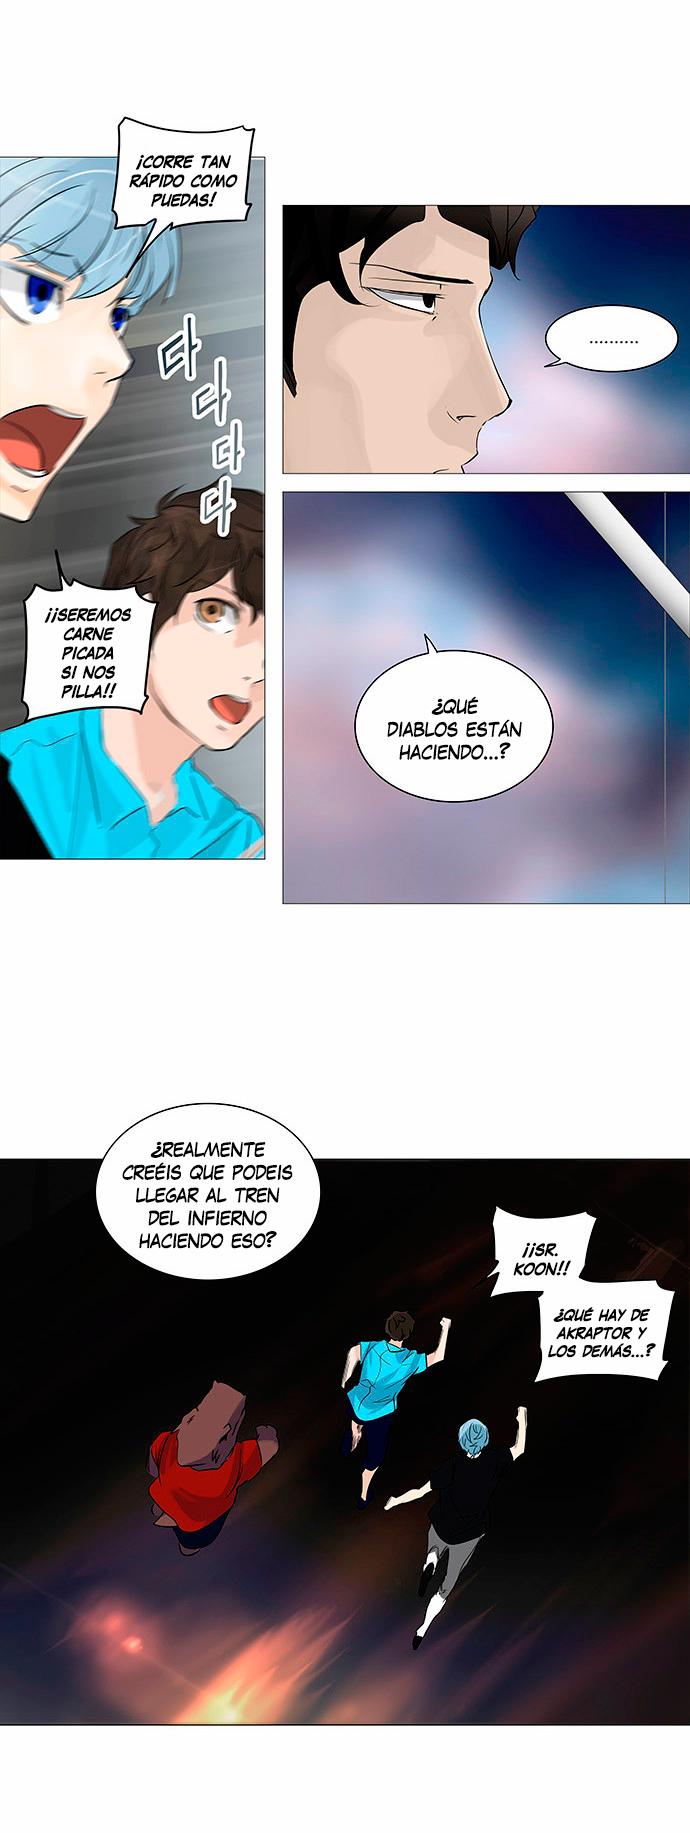 http://c5.ninemanga.com/es_manga/21/149/390885/5a45d7bae2d4d07061d3e882475b049b.jpg Page 7